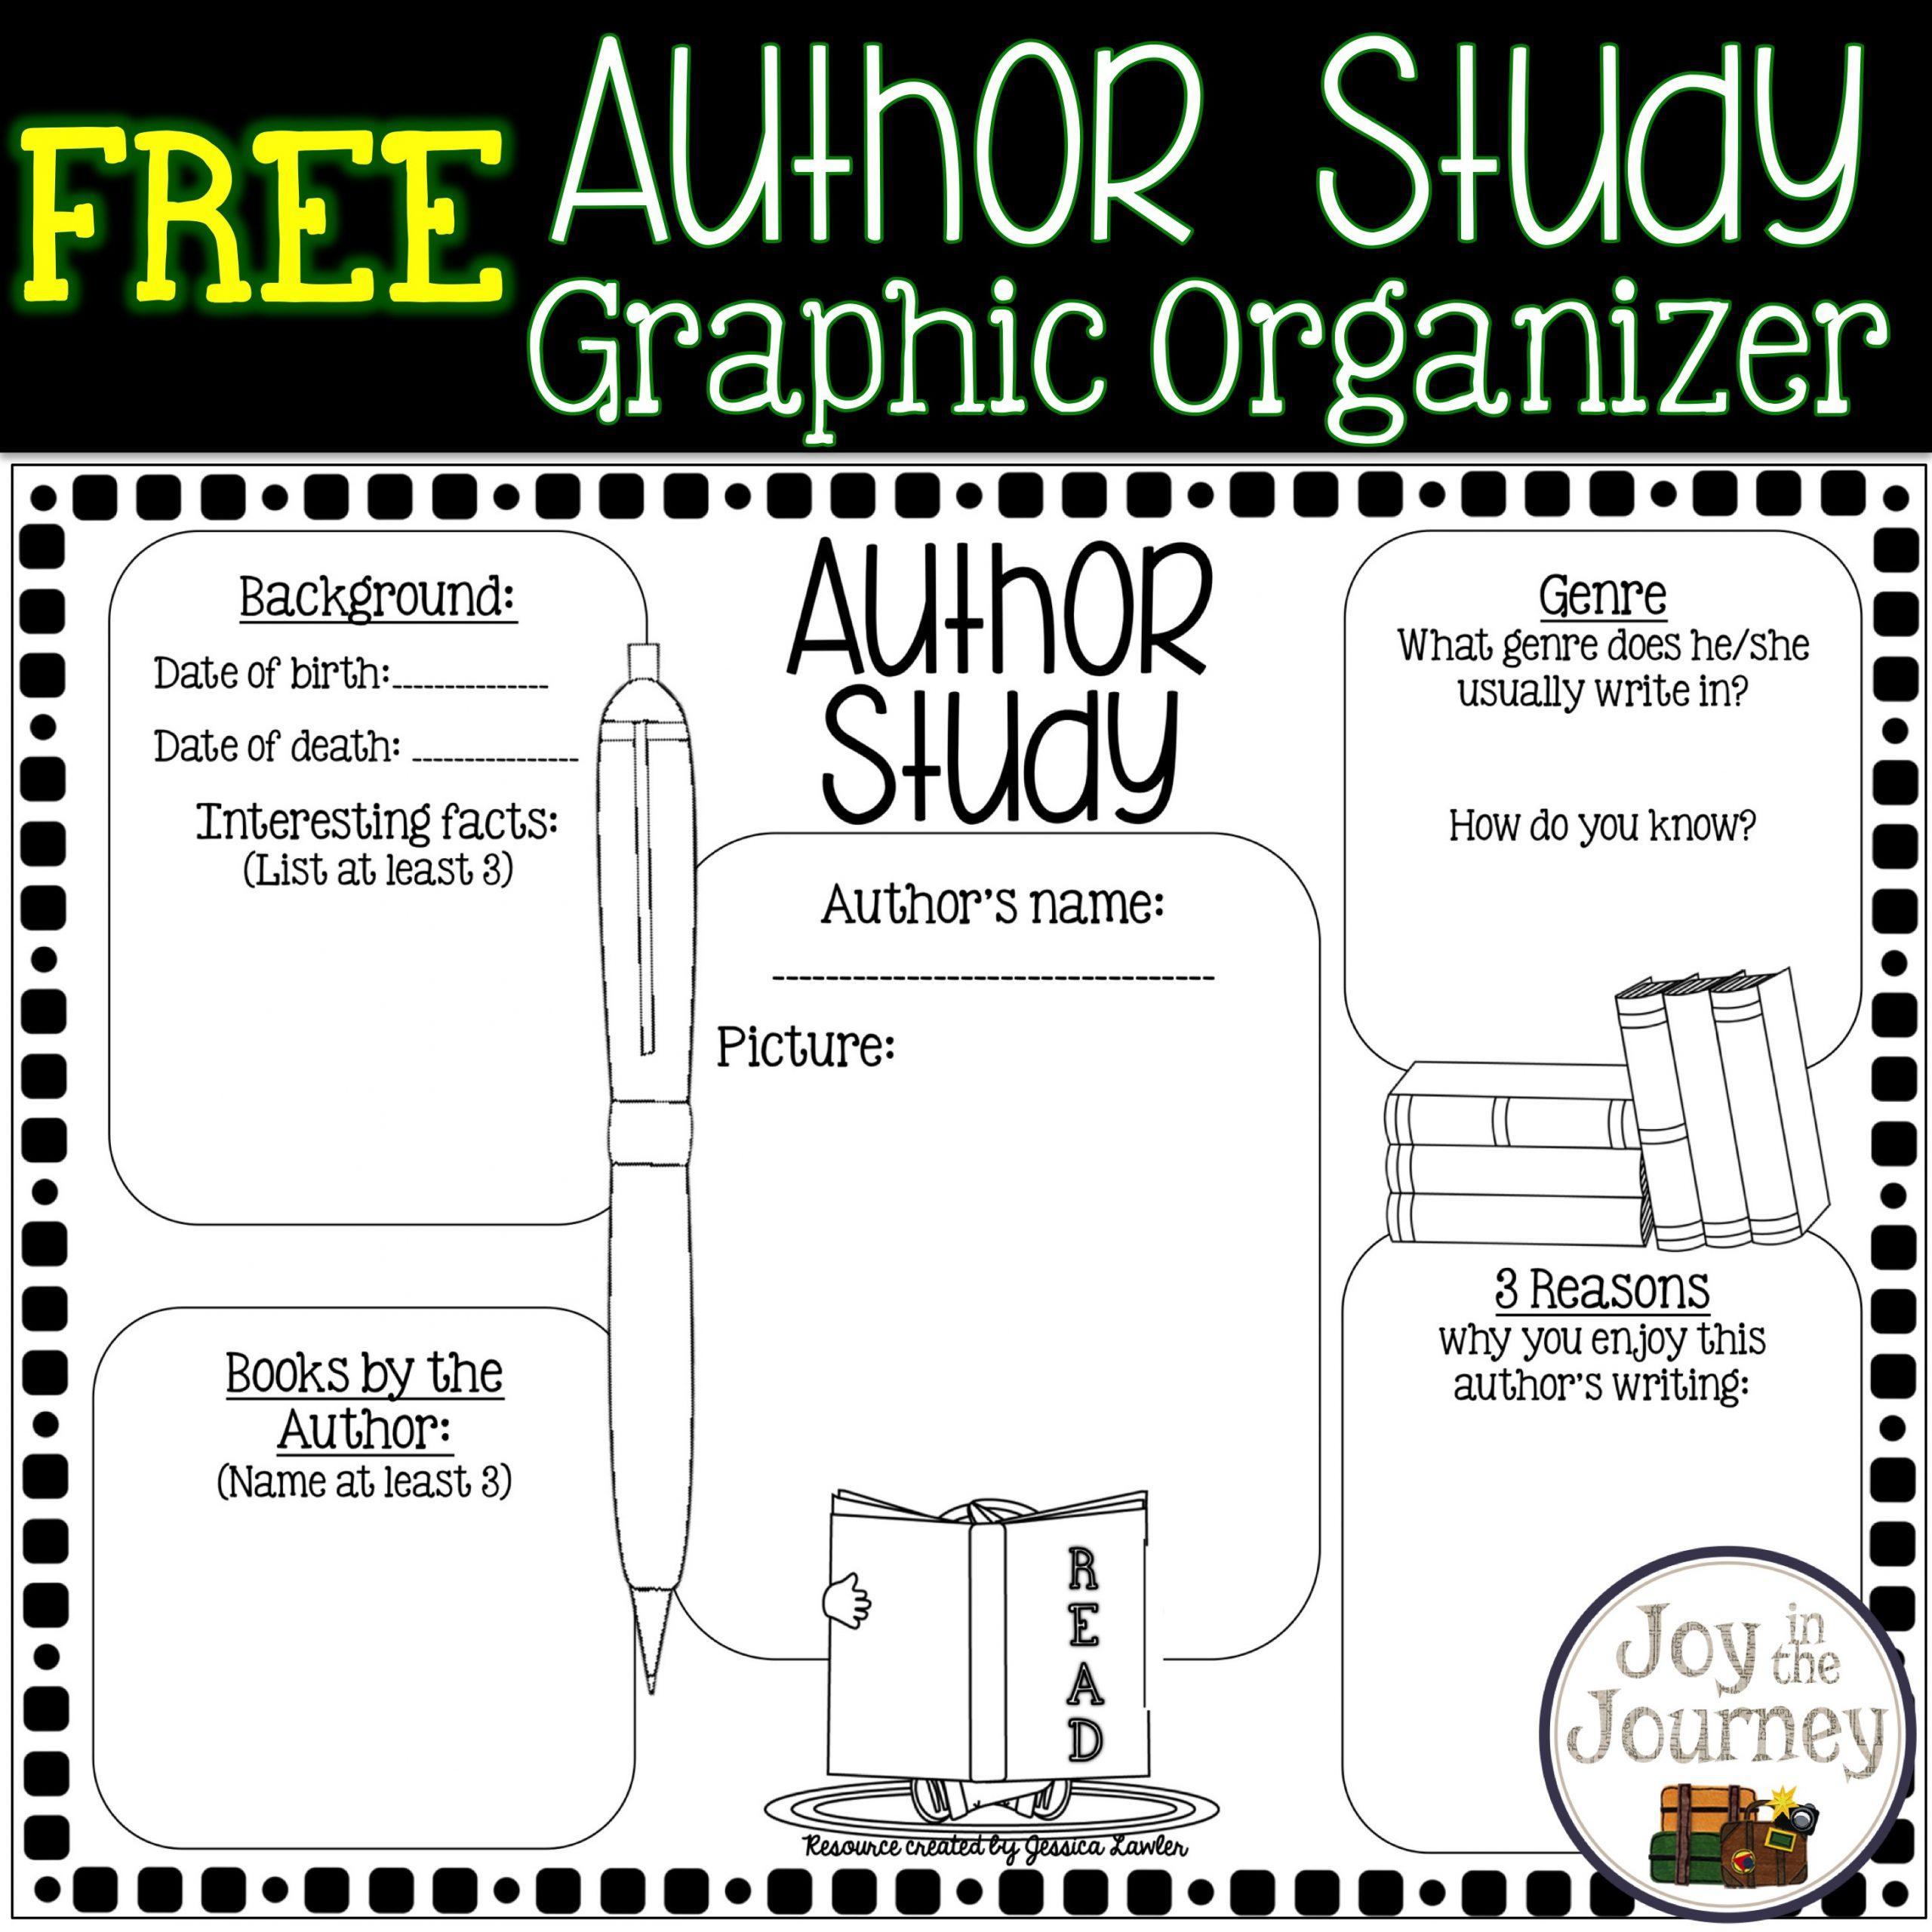 Free Author Study graphic organizer